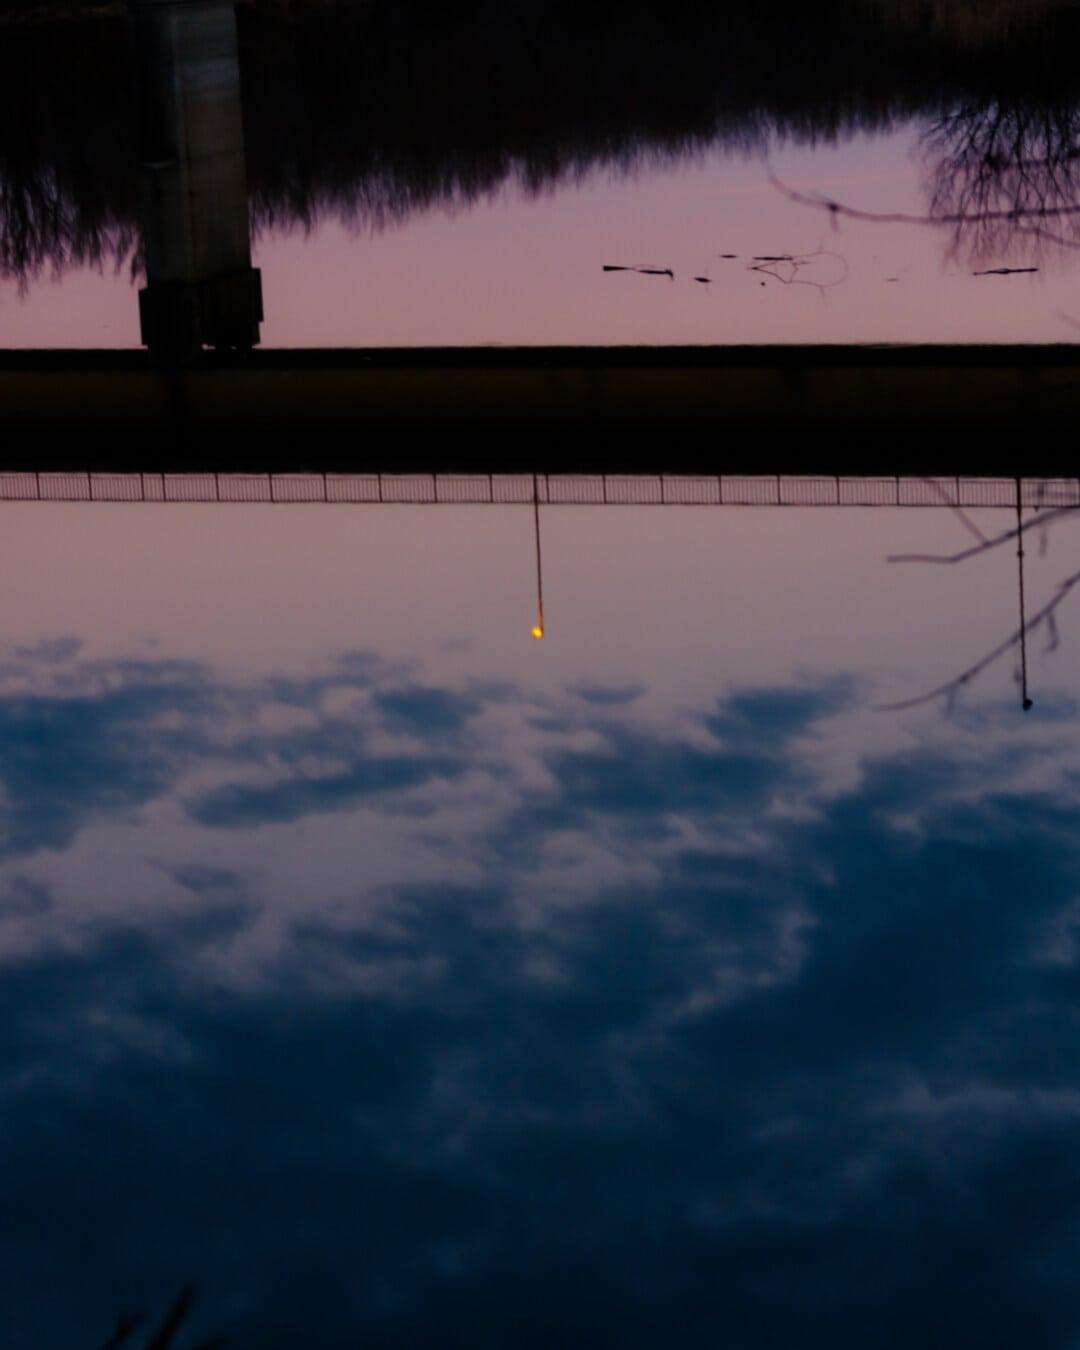 silhouette, reflection, twilight, dusk, bridge, water, sunset, dawn, light, nature